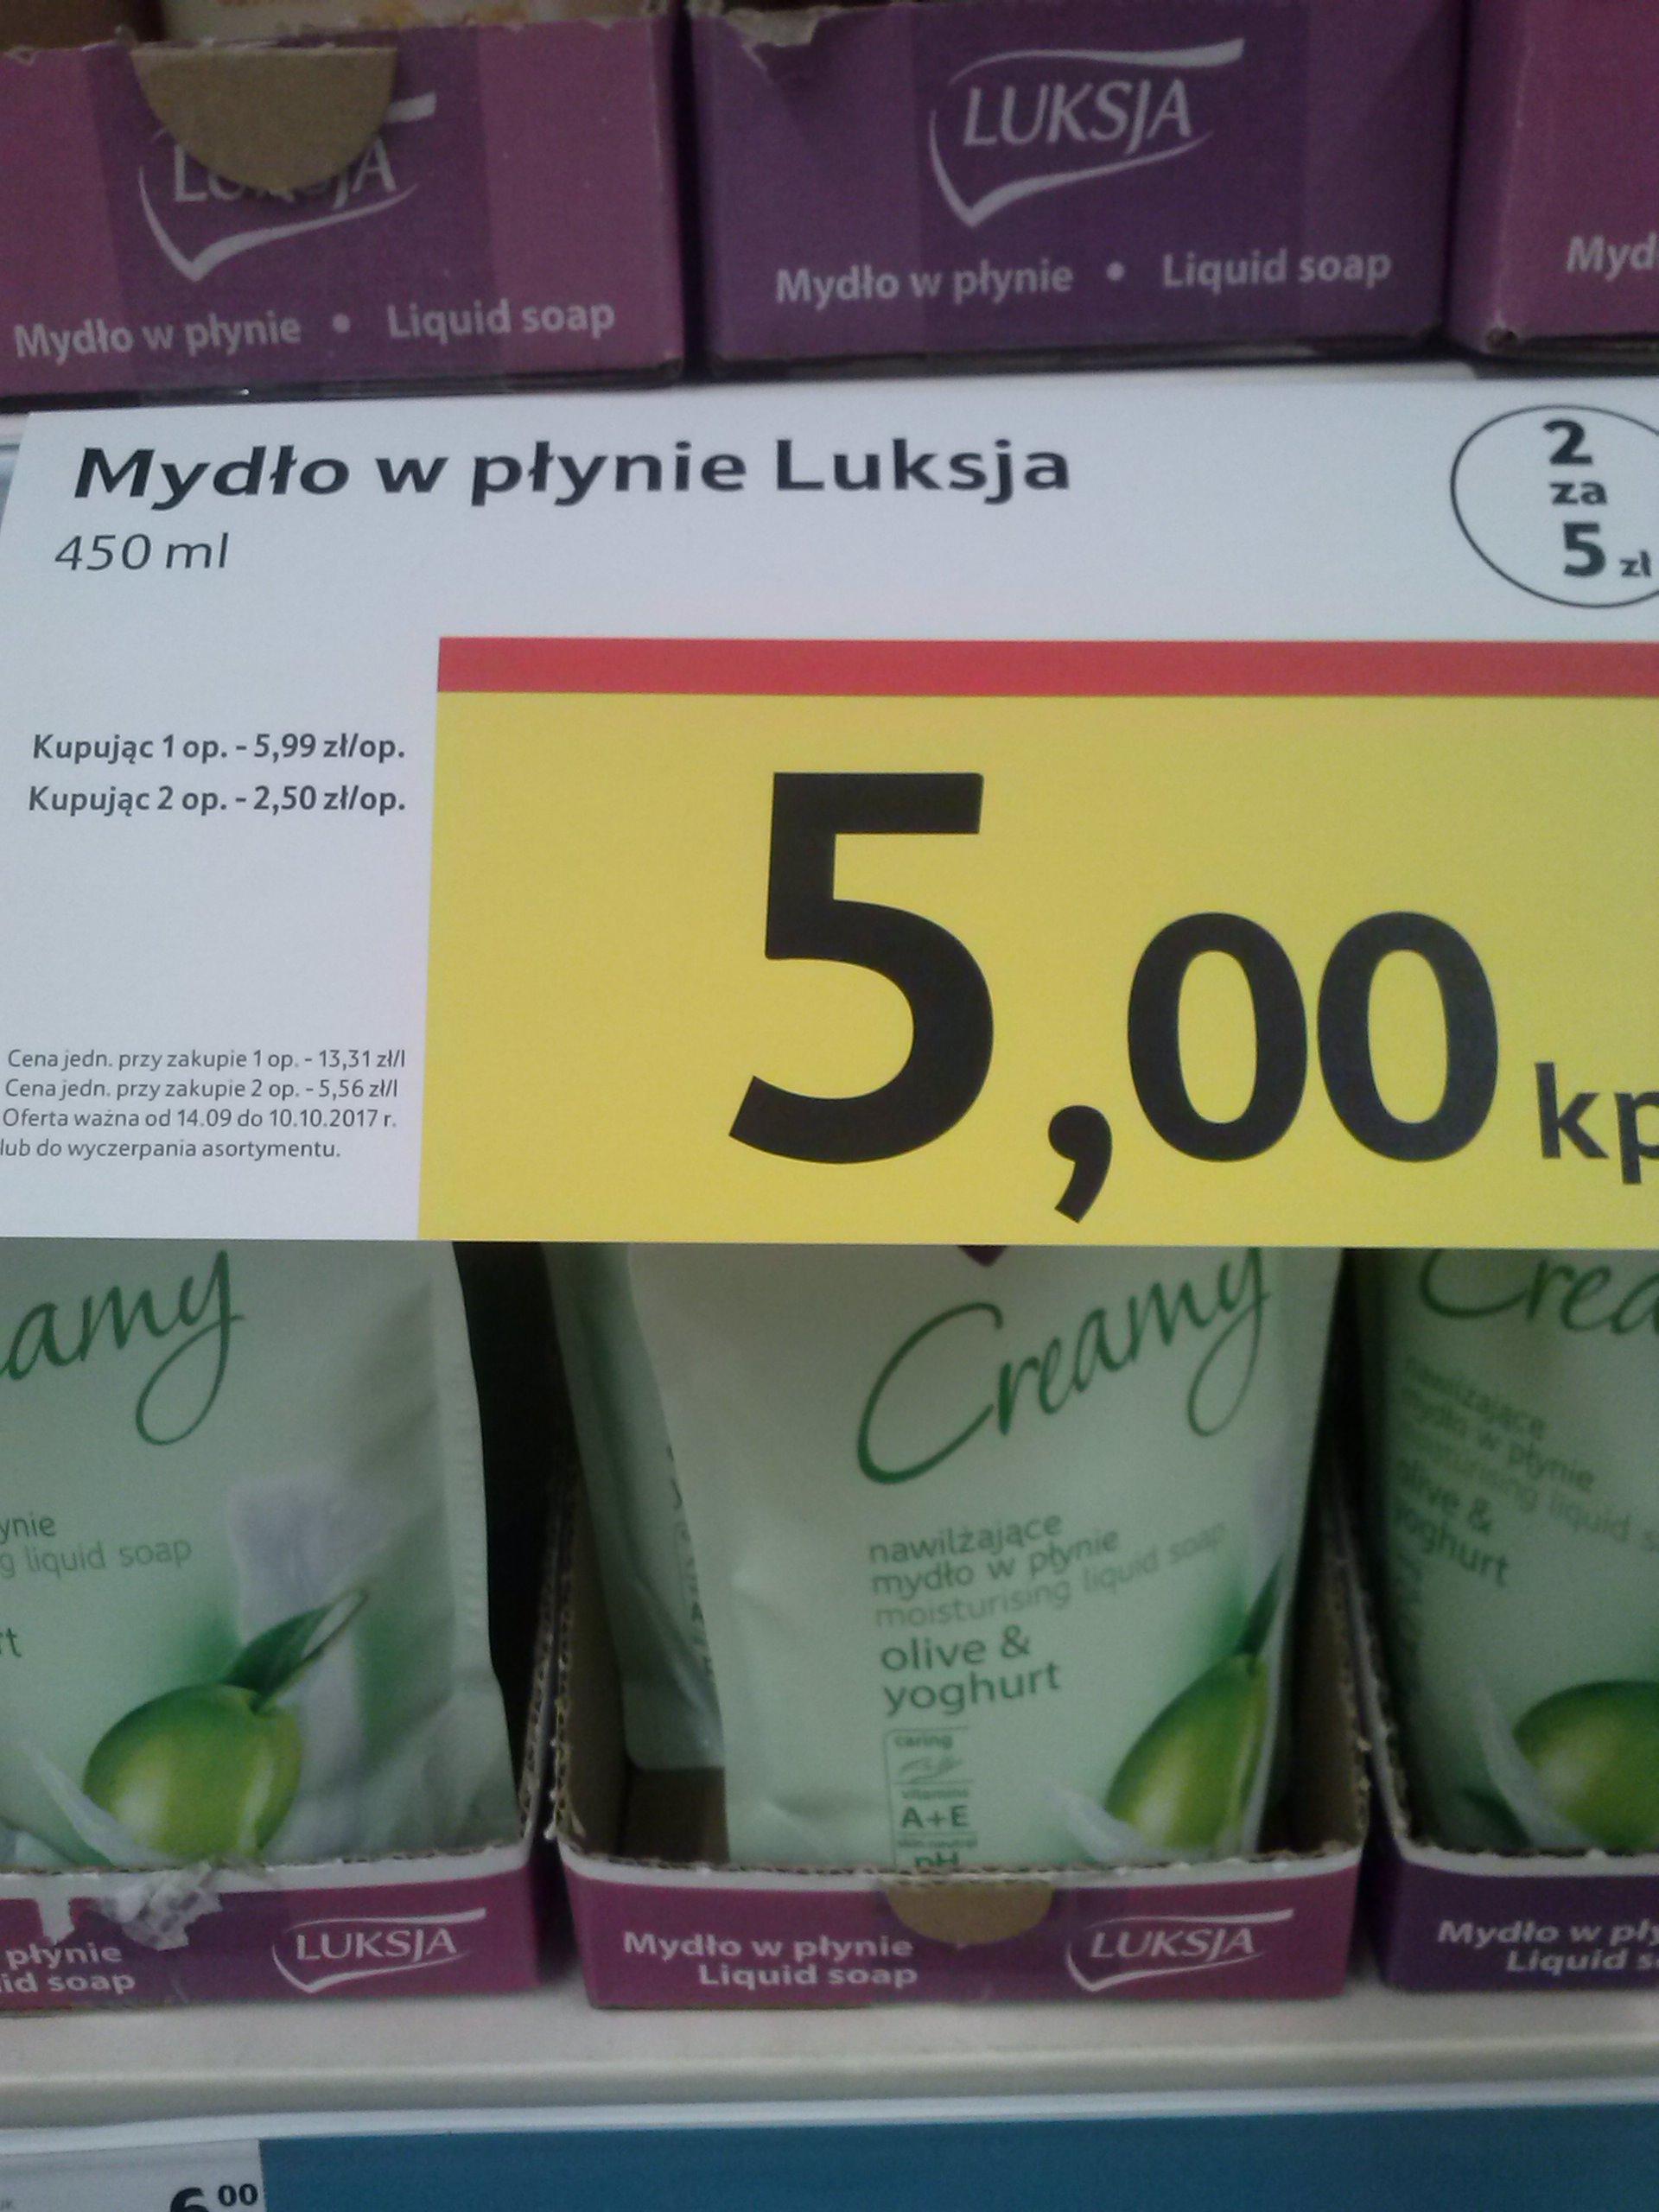 Mydło Luksja - 2 za 5 zł :D